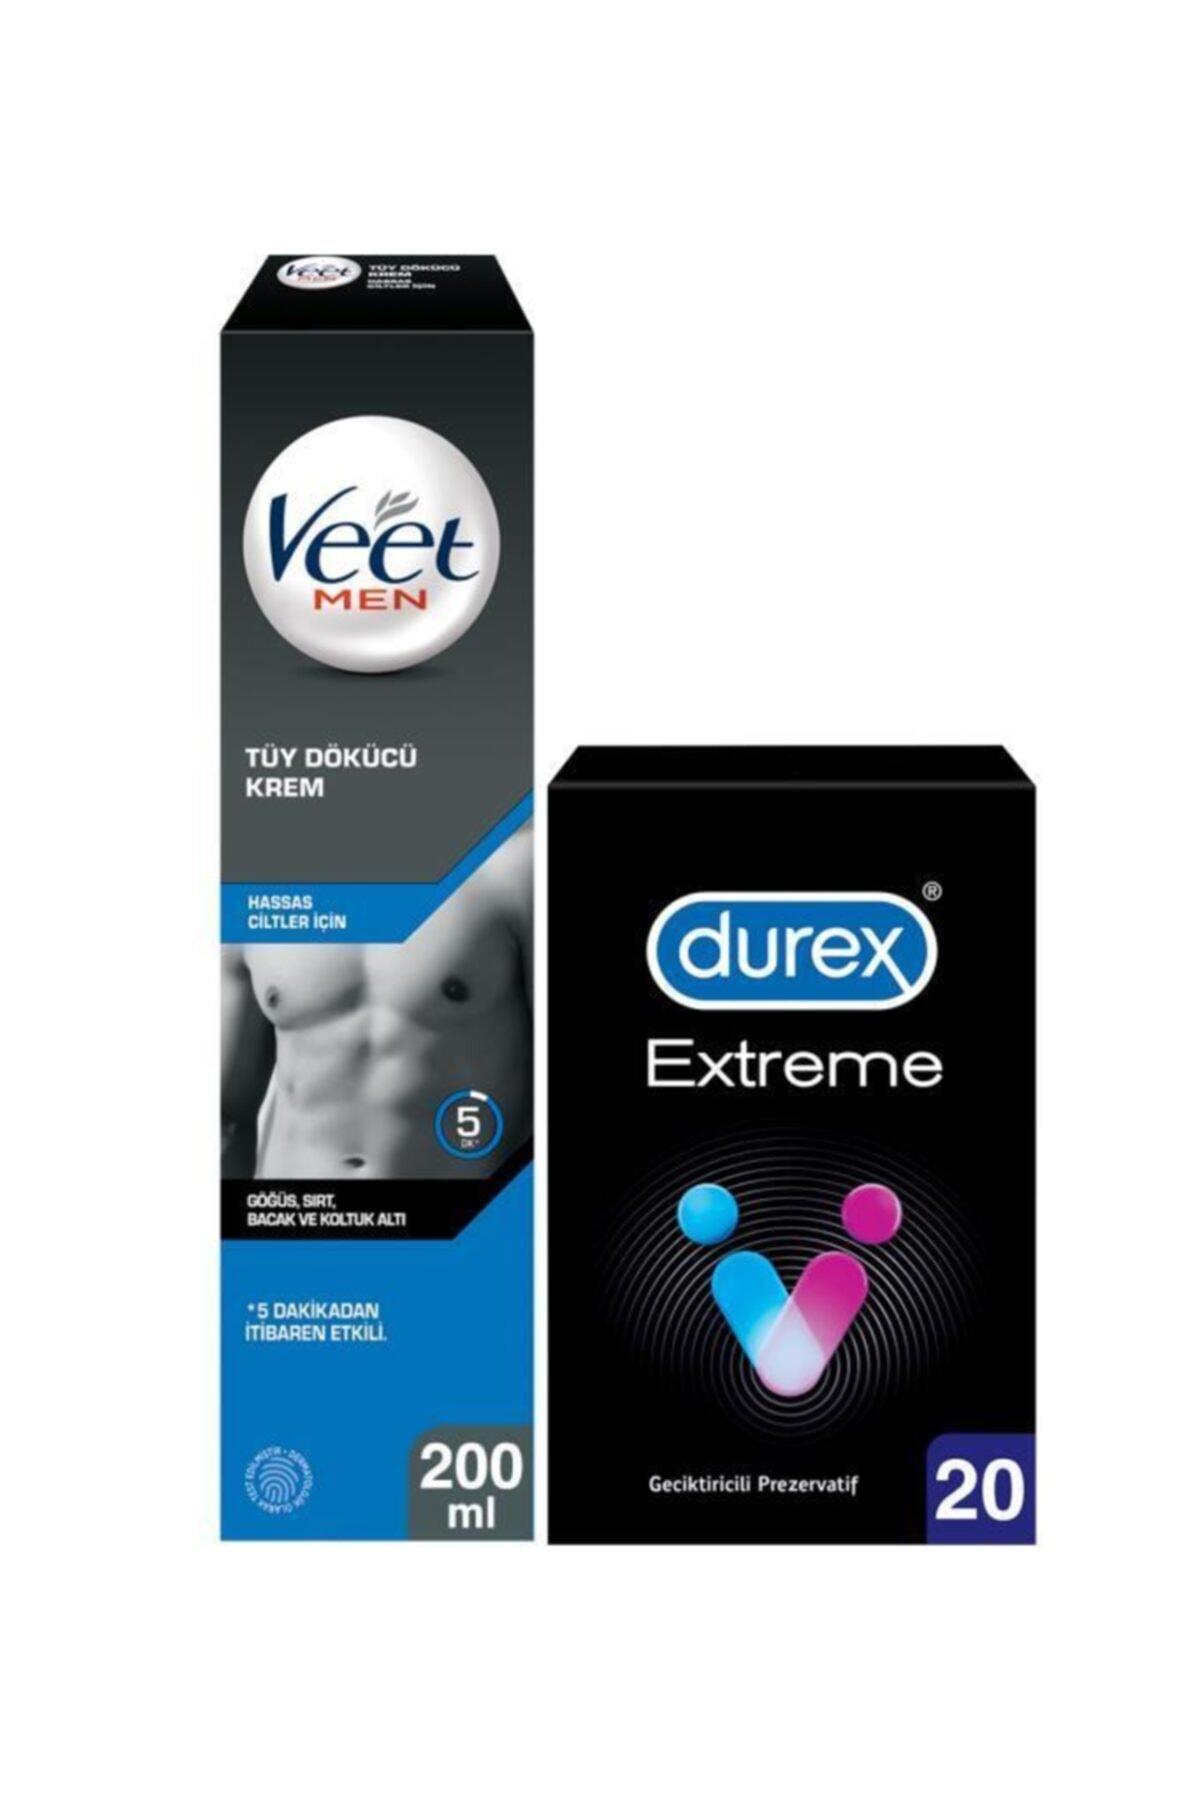 Veet Men Hassas Erkeklere Özel Tüy Dökücü Krem 200ml Durex Extreme Geciktiricili Prezervatif 20'li 1